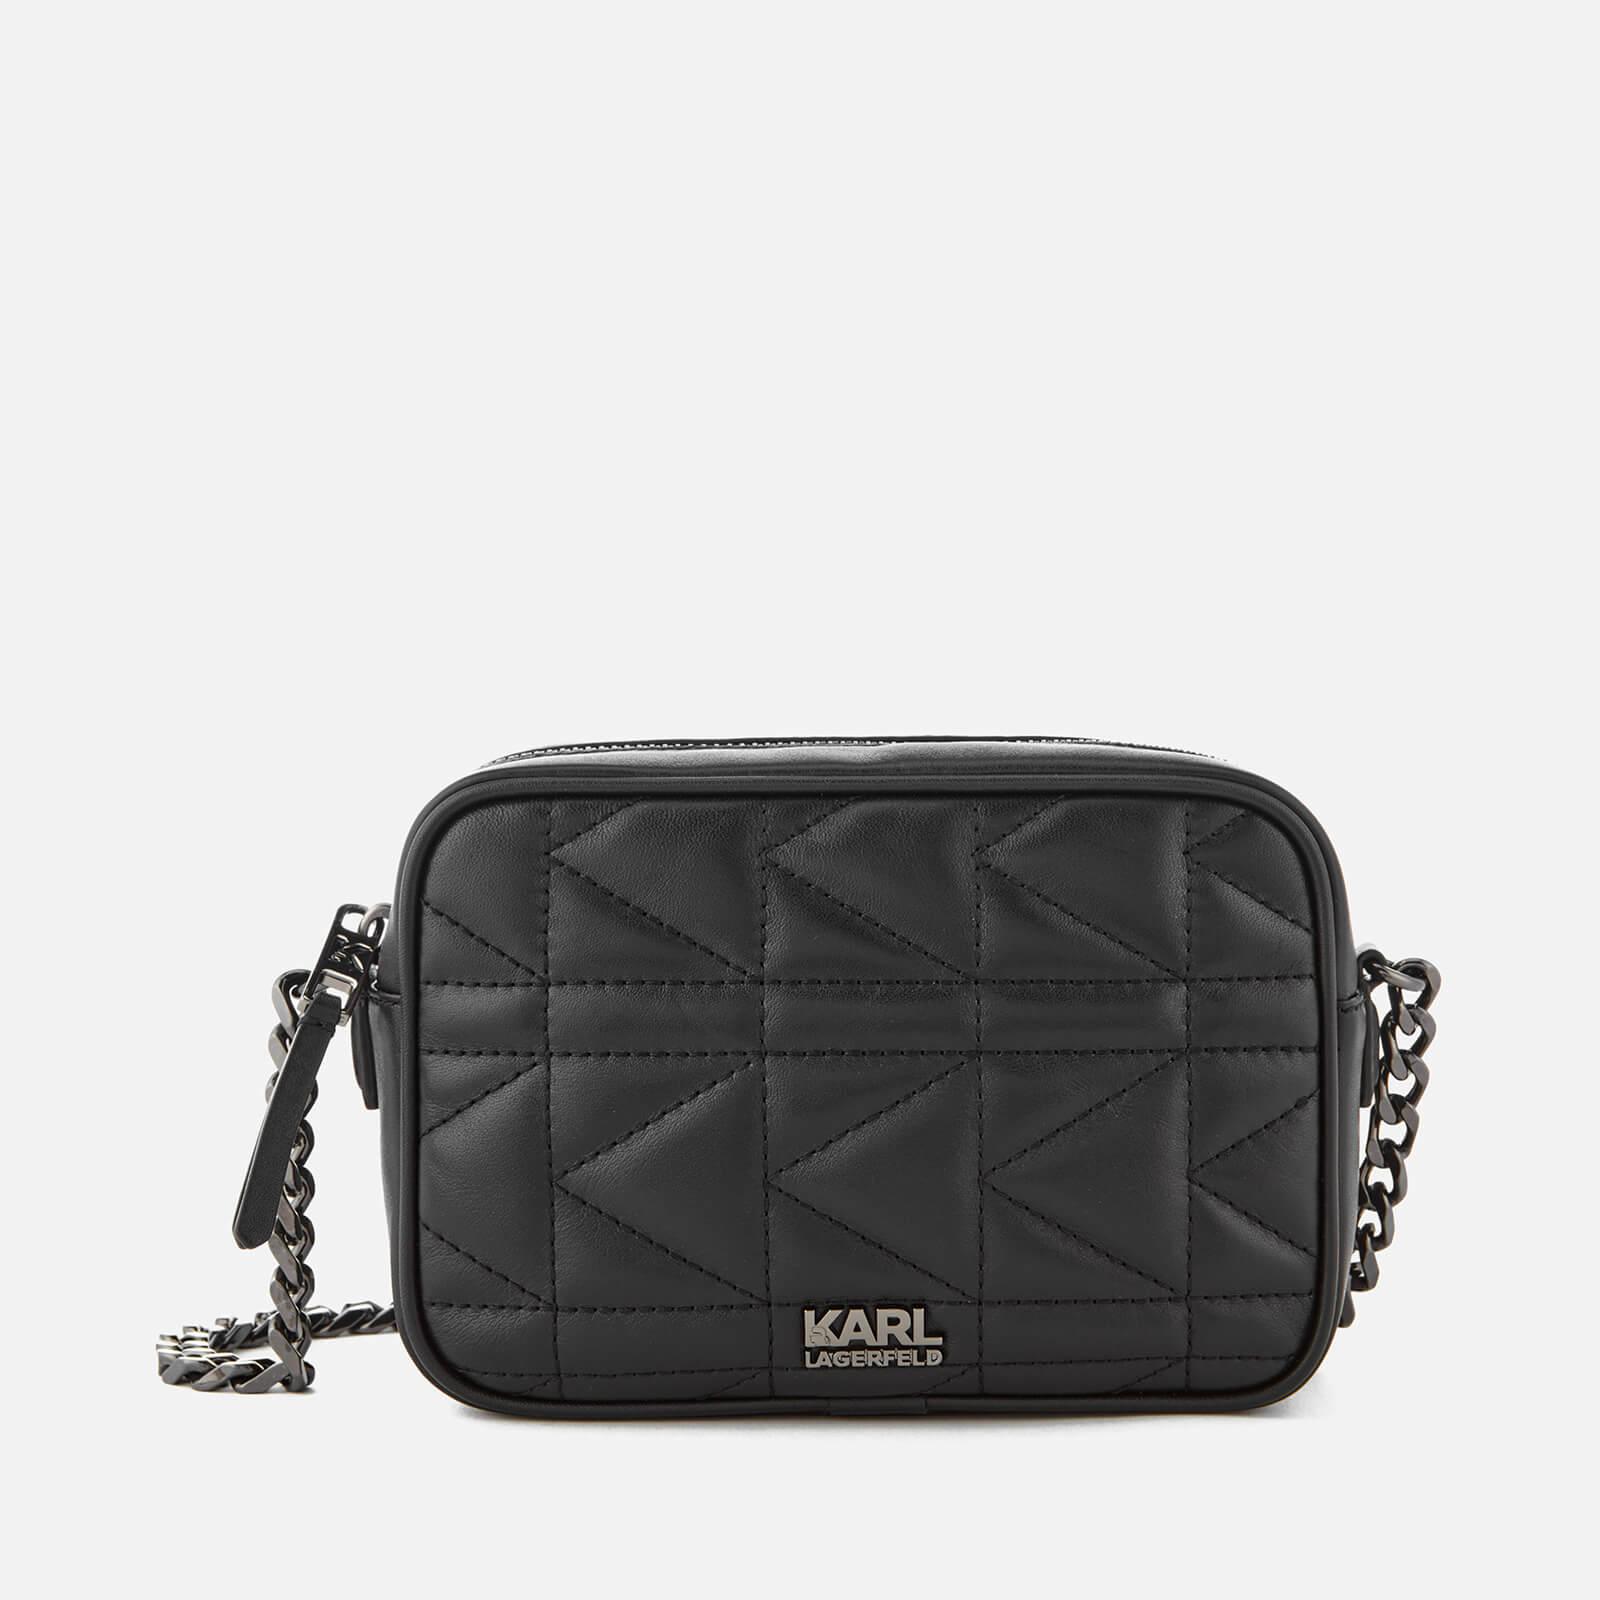 833994ea406f Karl Lagerfeld Women s K Kuilted Cross Body Bag - Black Gun metal - Free UK  Delivery over £50